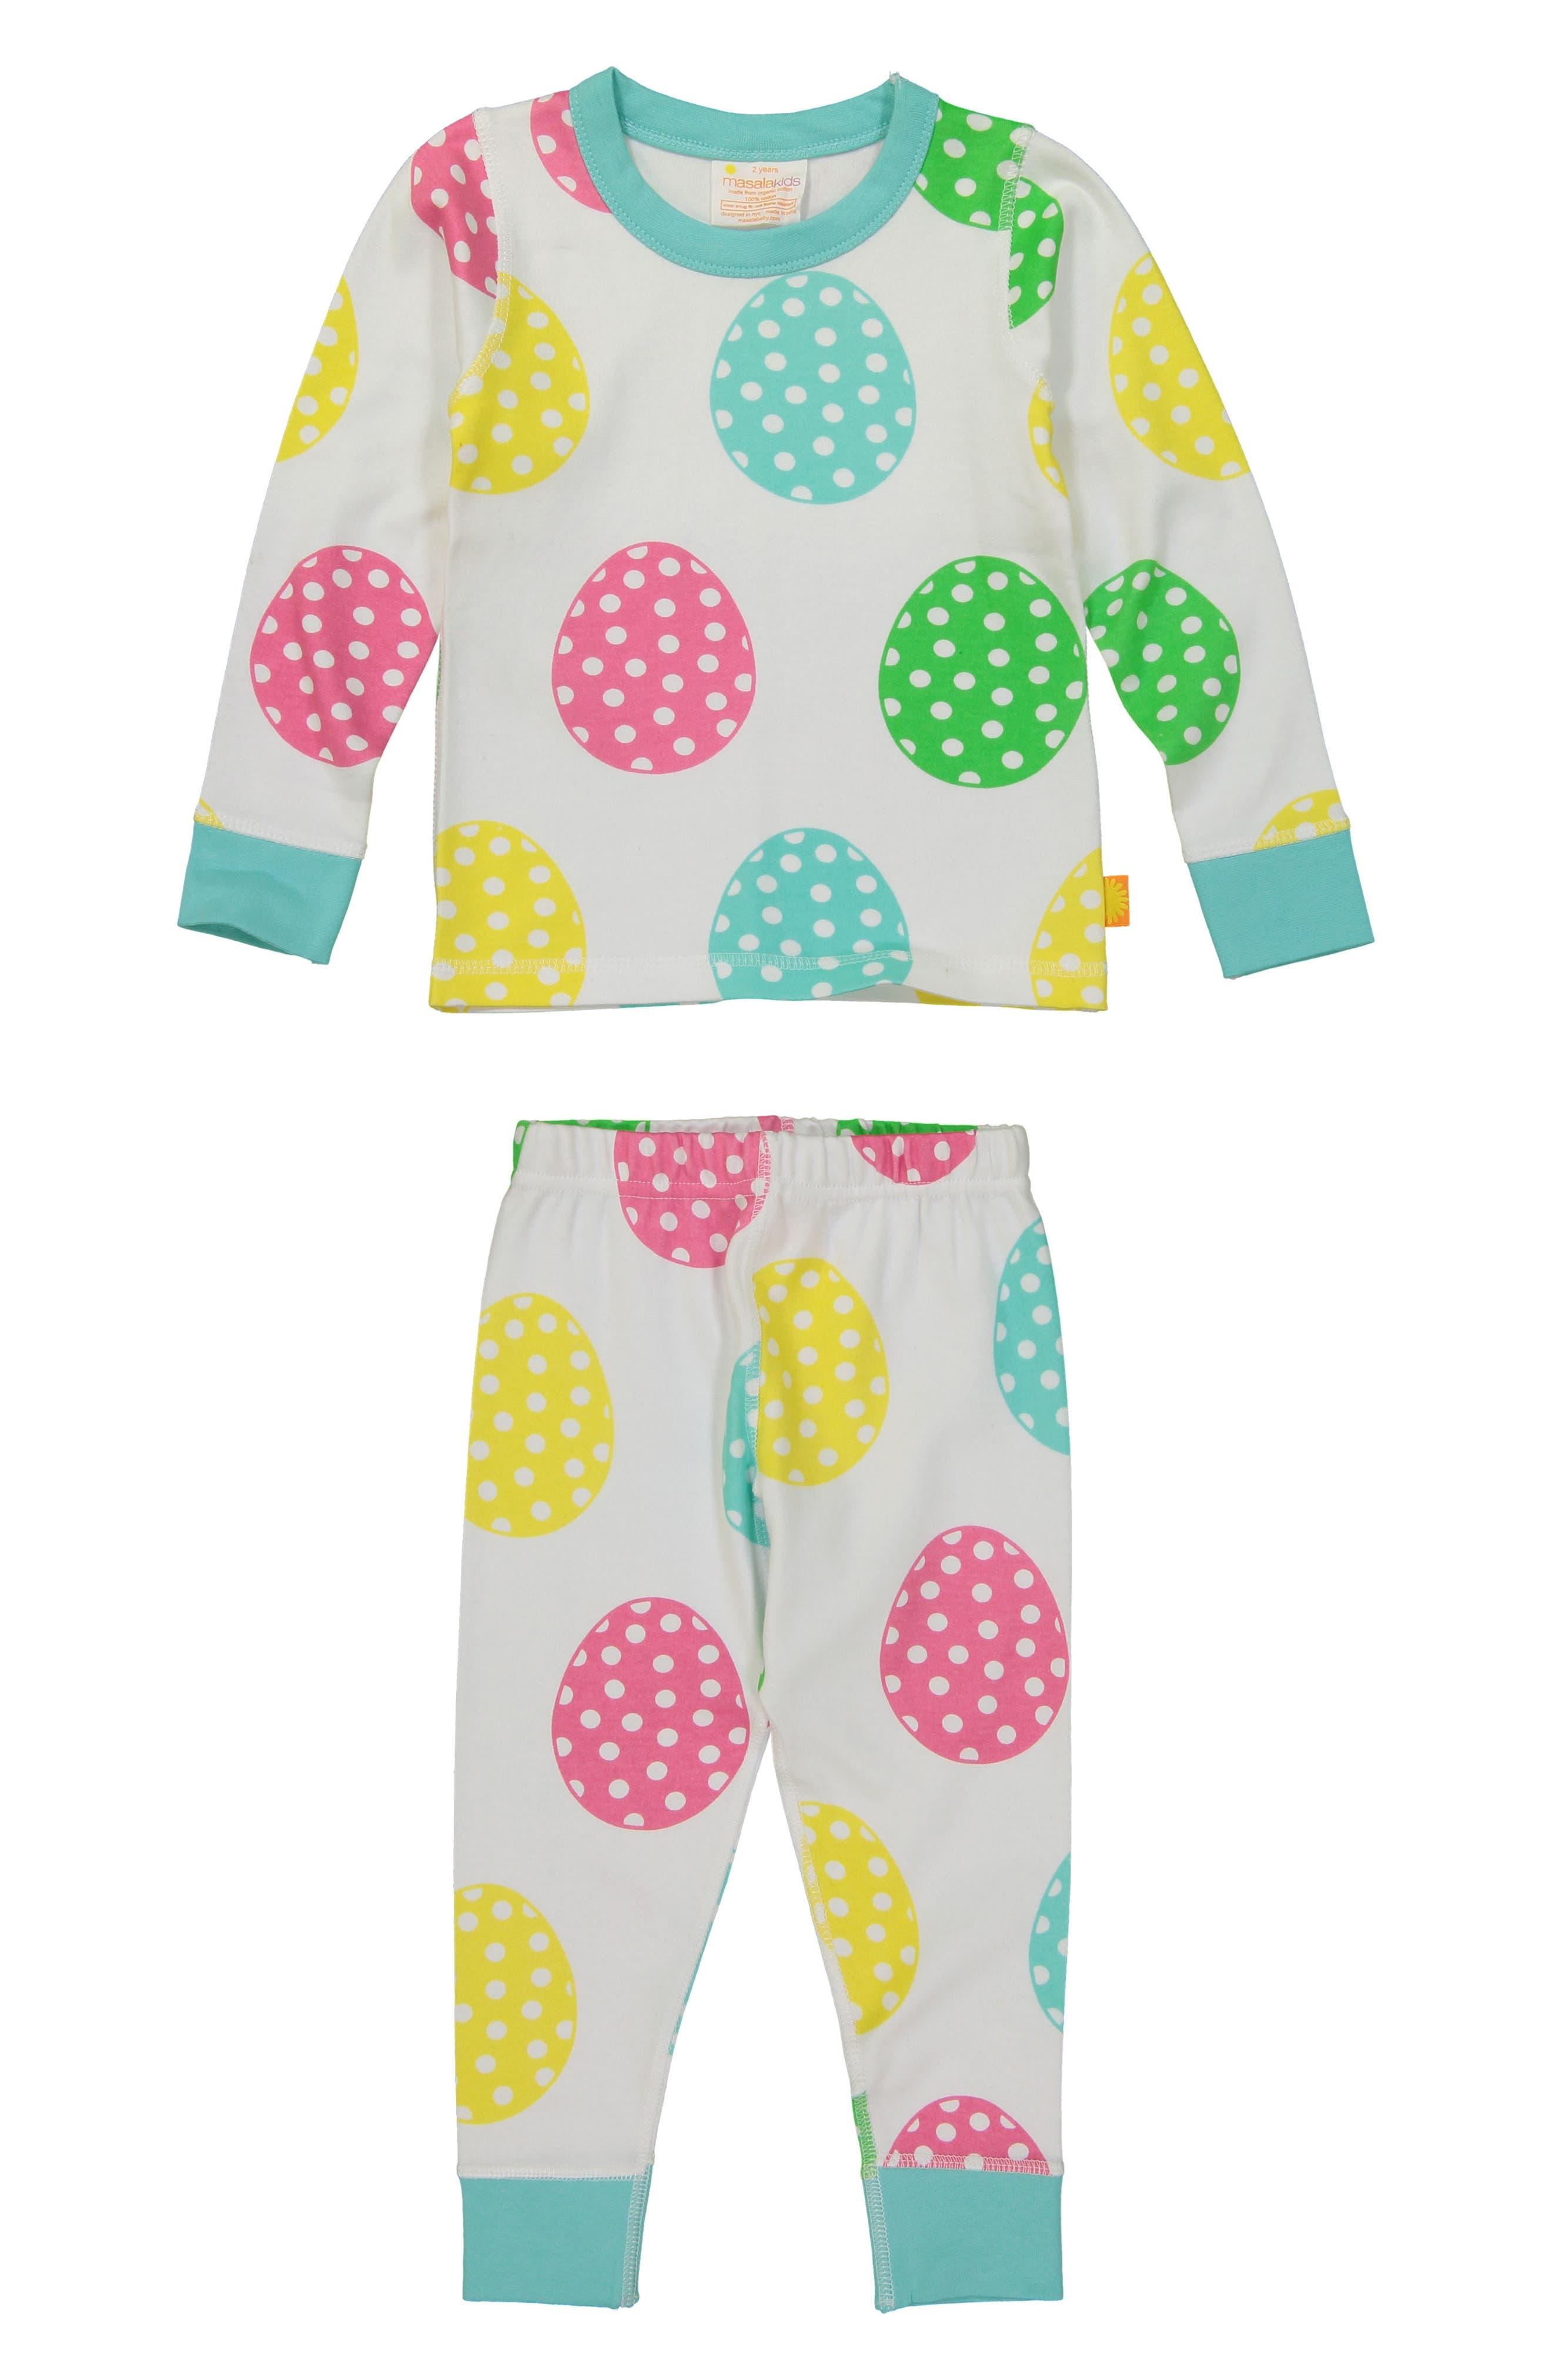 Masala Baby Rainbow Fitted Two-Piece Organic Cotton Pajamas (Baby Girls)